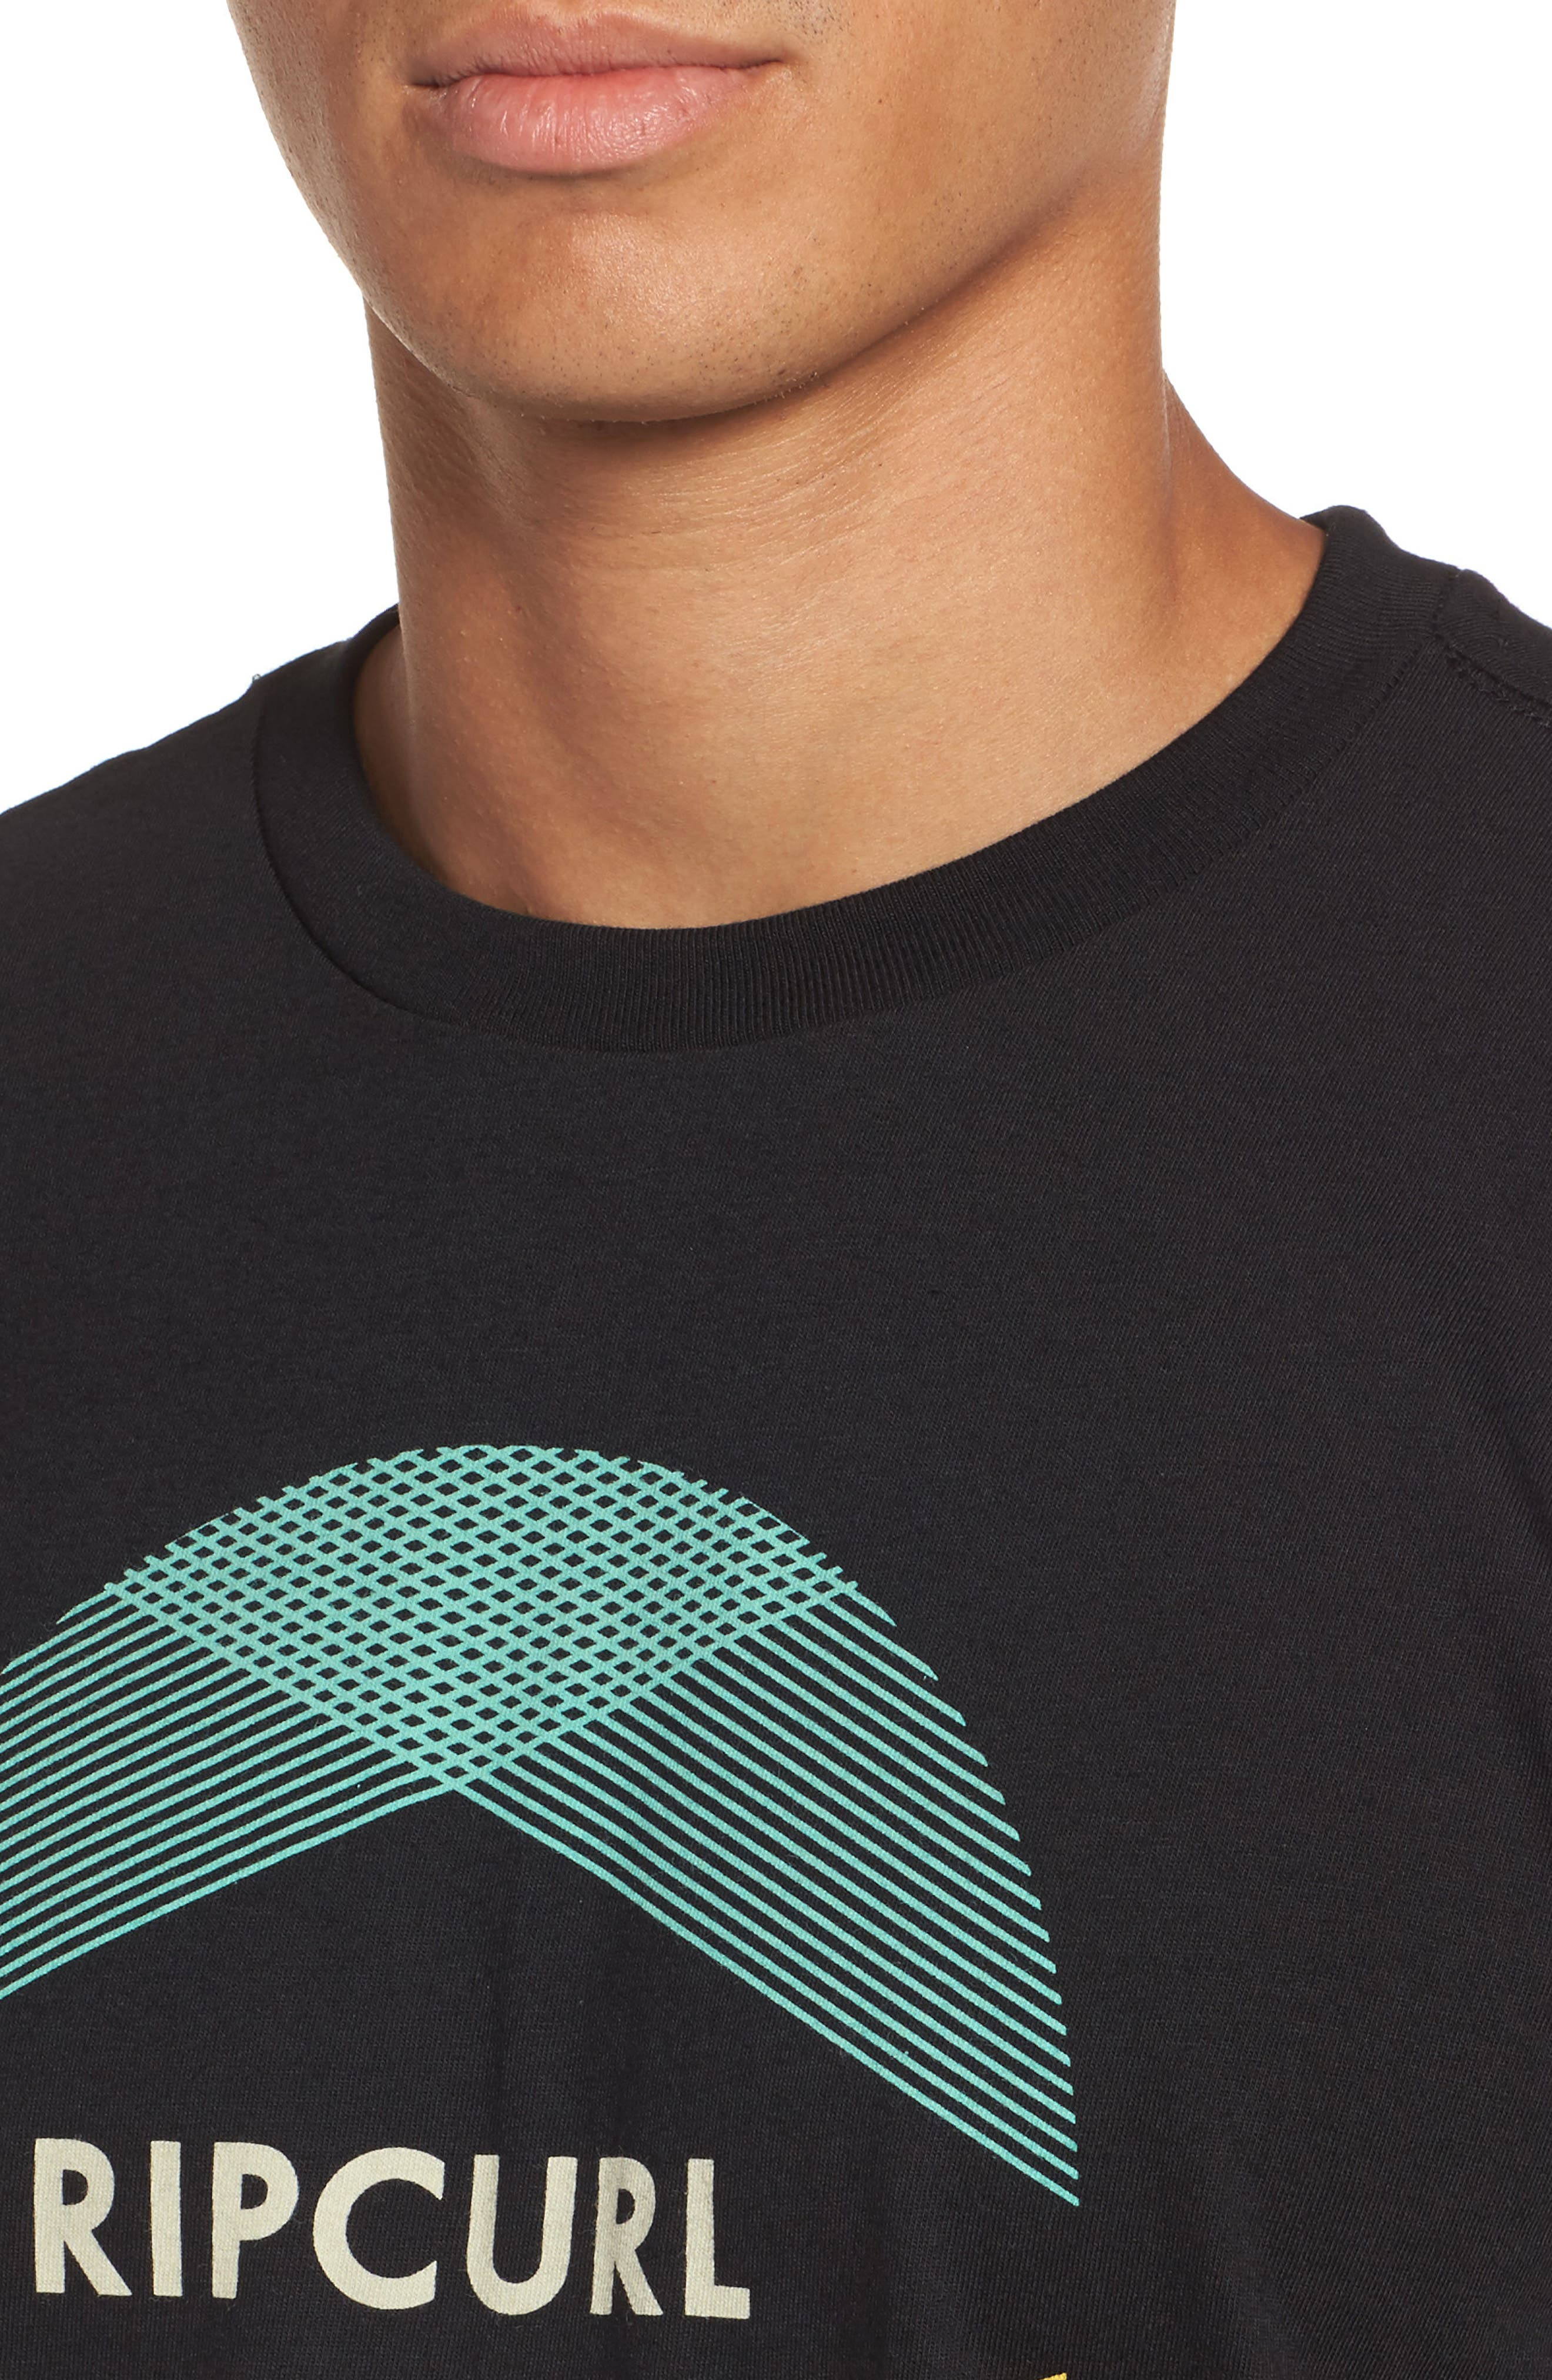 Calypso Classic Logo Graphic T-Shirt,                             Alternate thumbnail 4, color,                             001